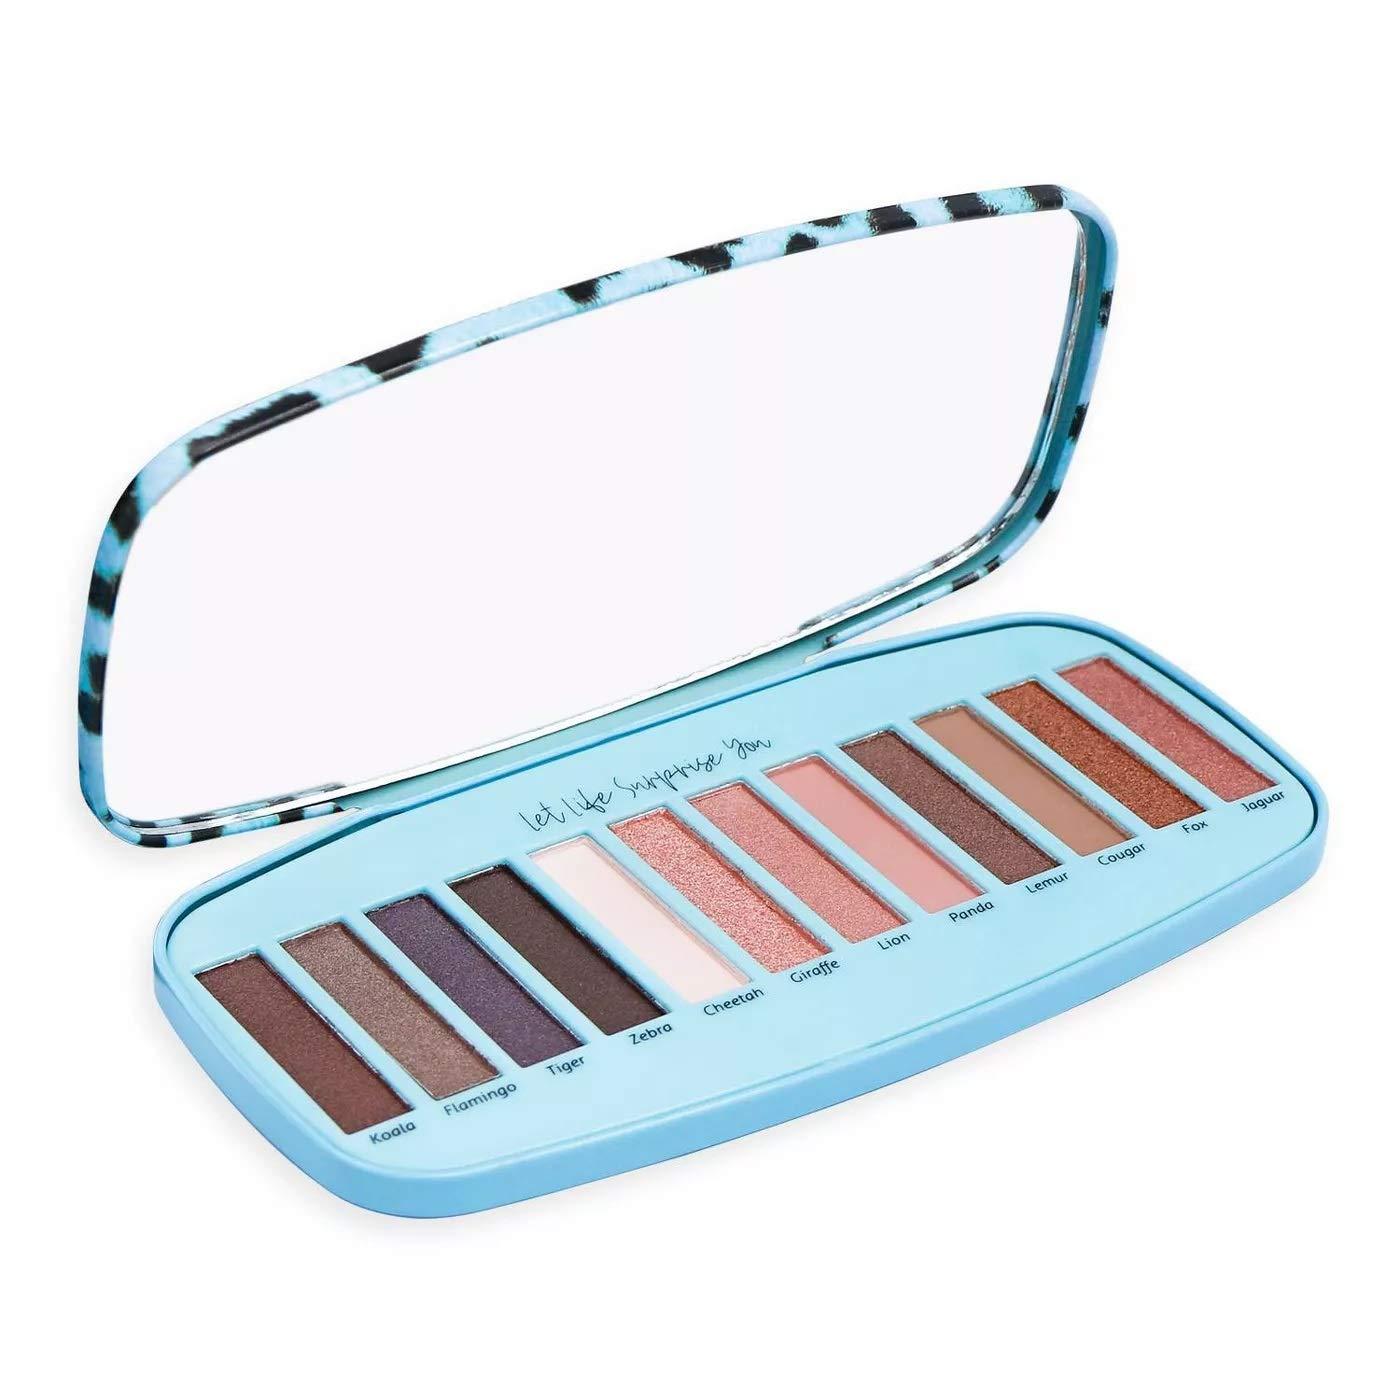 Cai Blue Animal Print Eyeshadow Palette – 15 Shades